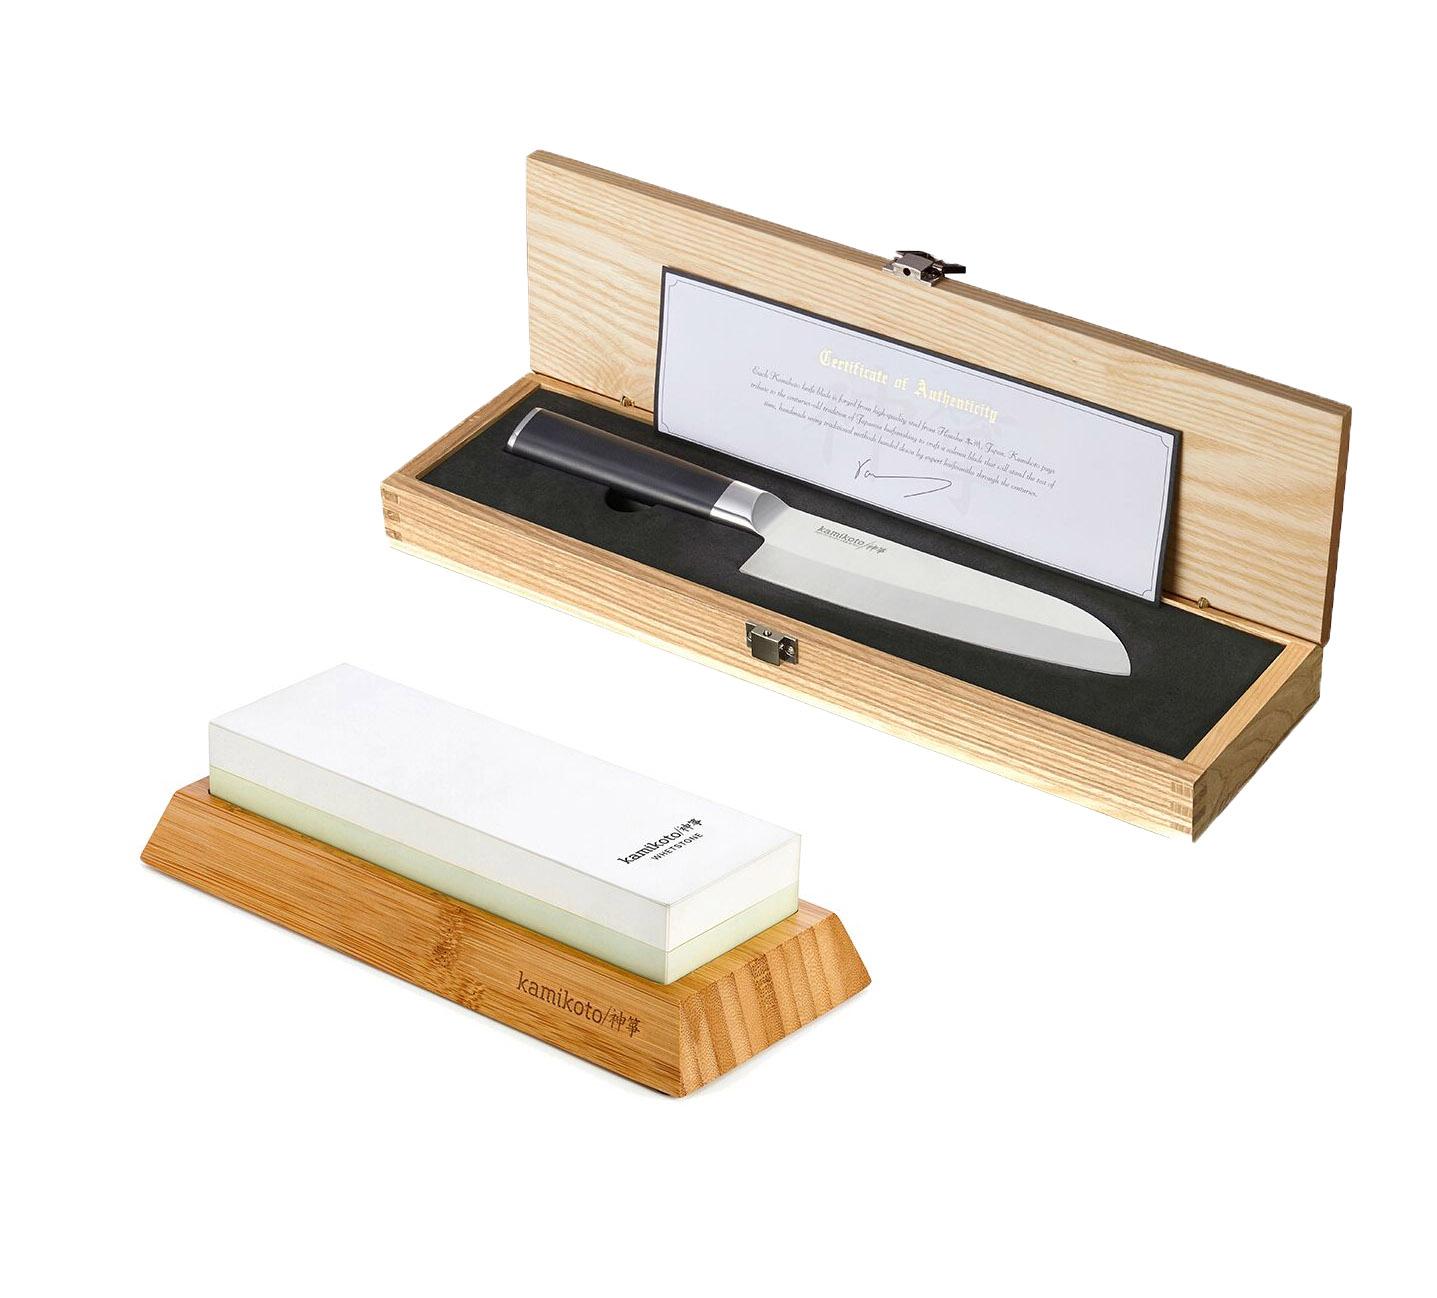 7-Inch Santoku Knife & 1000/3000 Toishi Whetstone